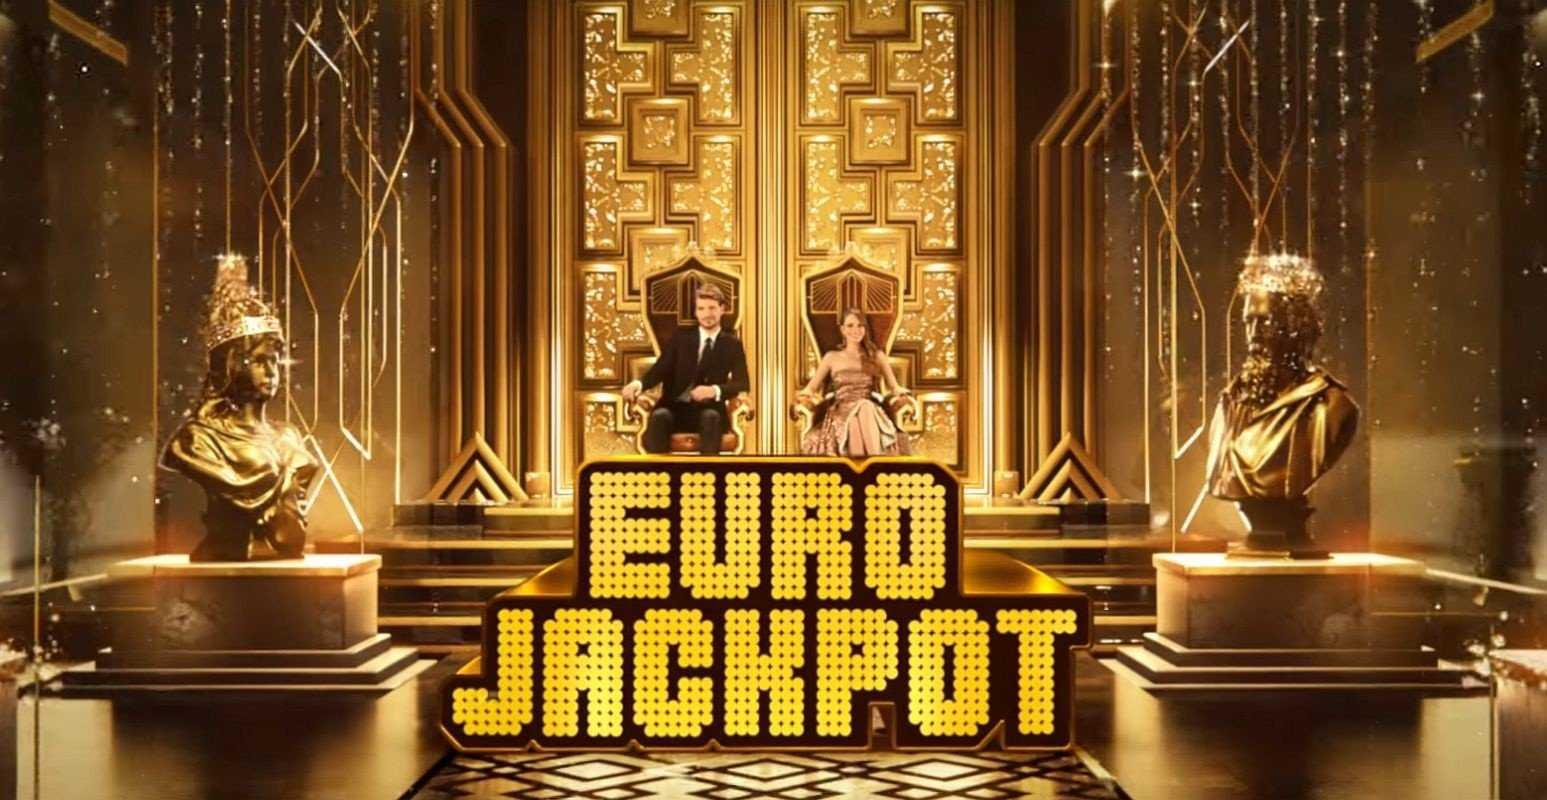 Gioca a Eurojackpot online oggi - eurojackpot online